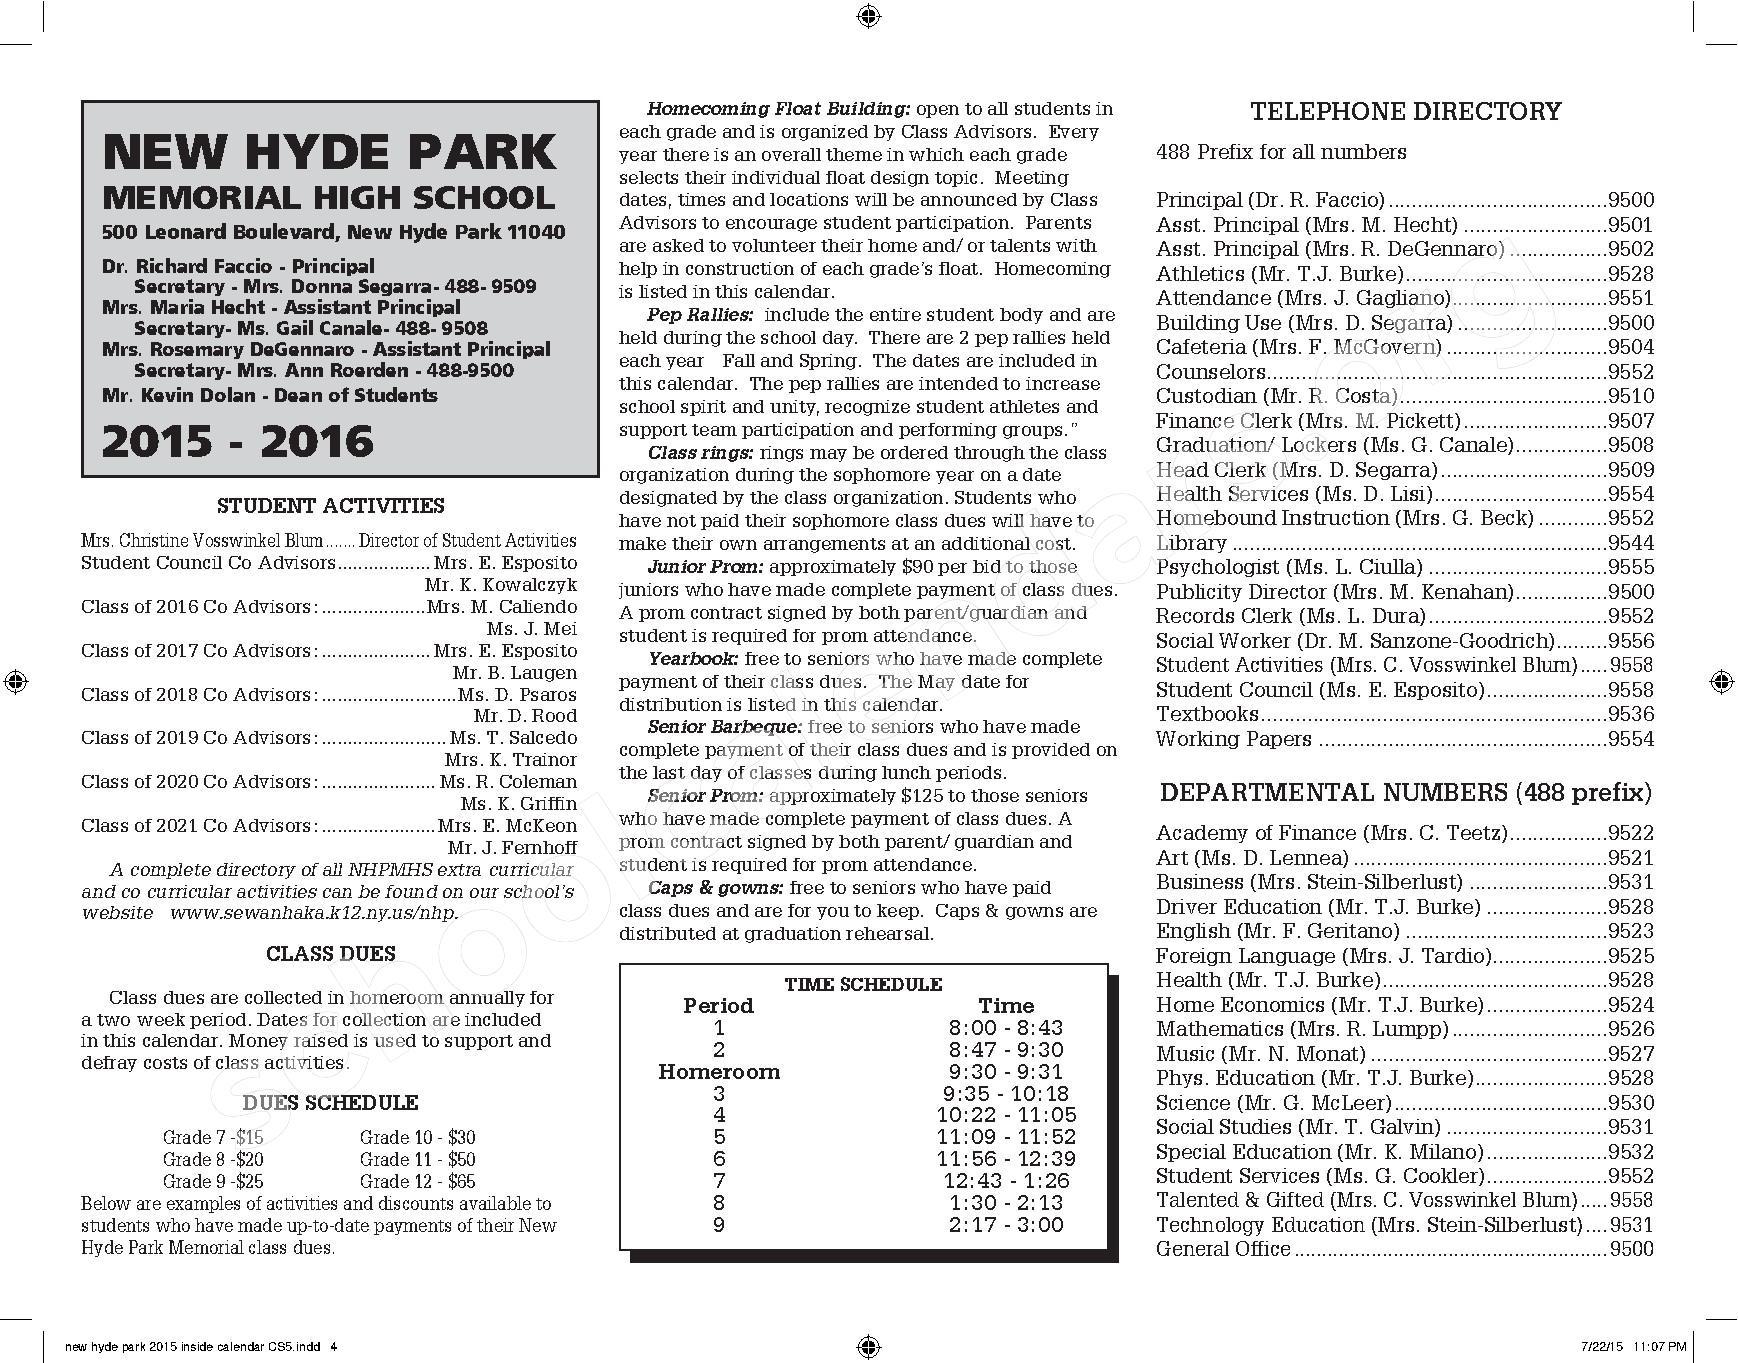 2015 - 2016 New Hyde Park Memorial HS Calendar – New Hyde Park Memorial High School – page 4